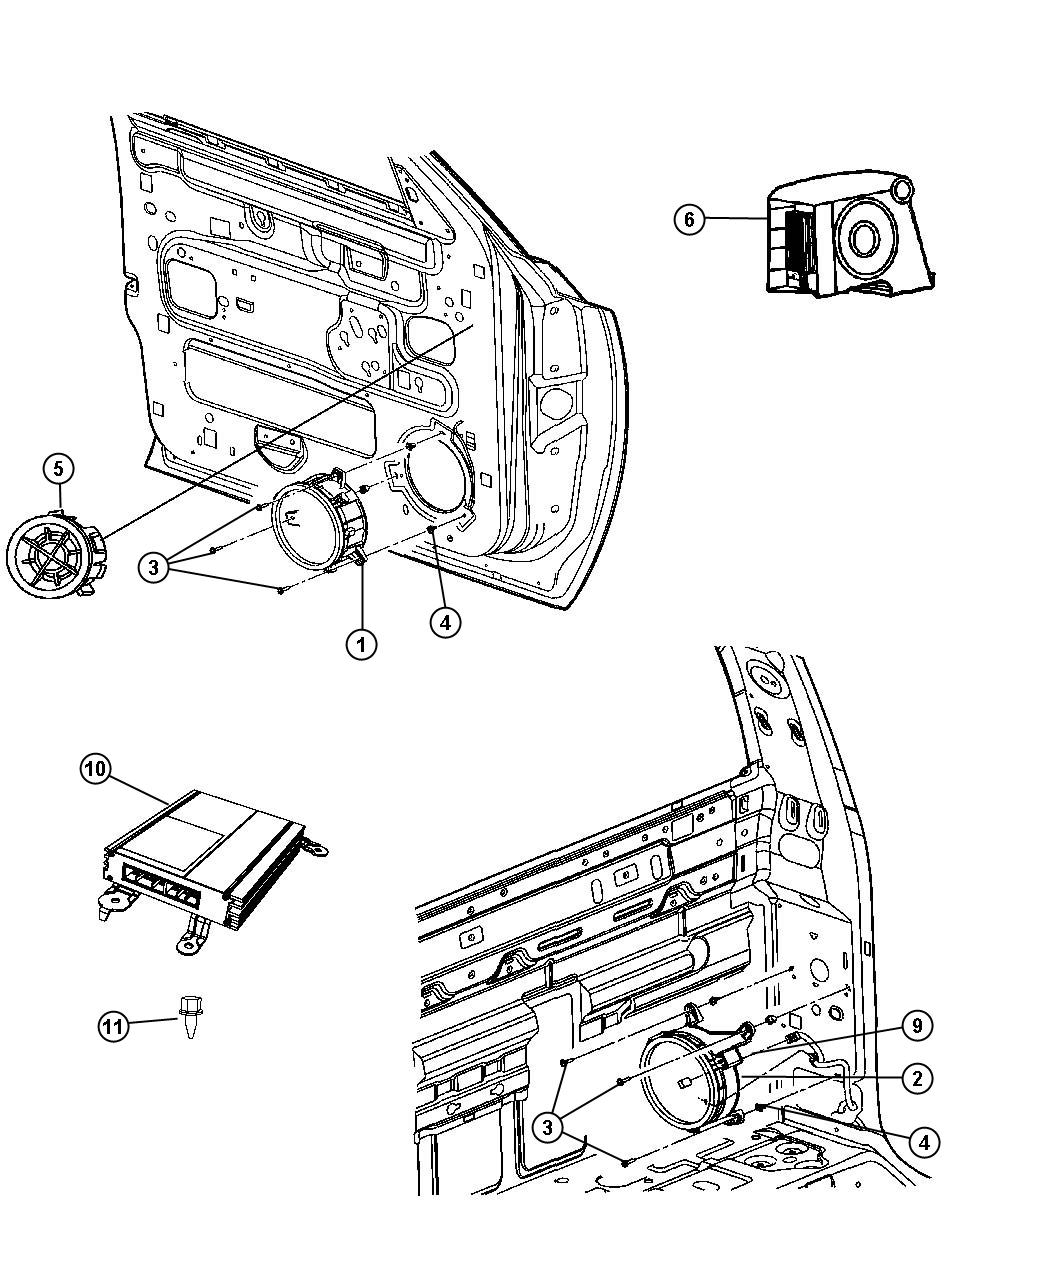 Dodge Dakota Slt Quad Cab 4 7l V8 M T 4x4 Speaker 6